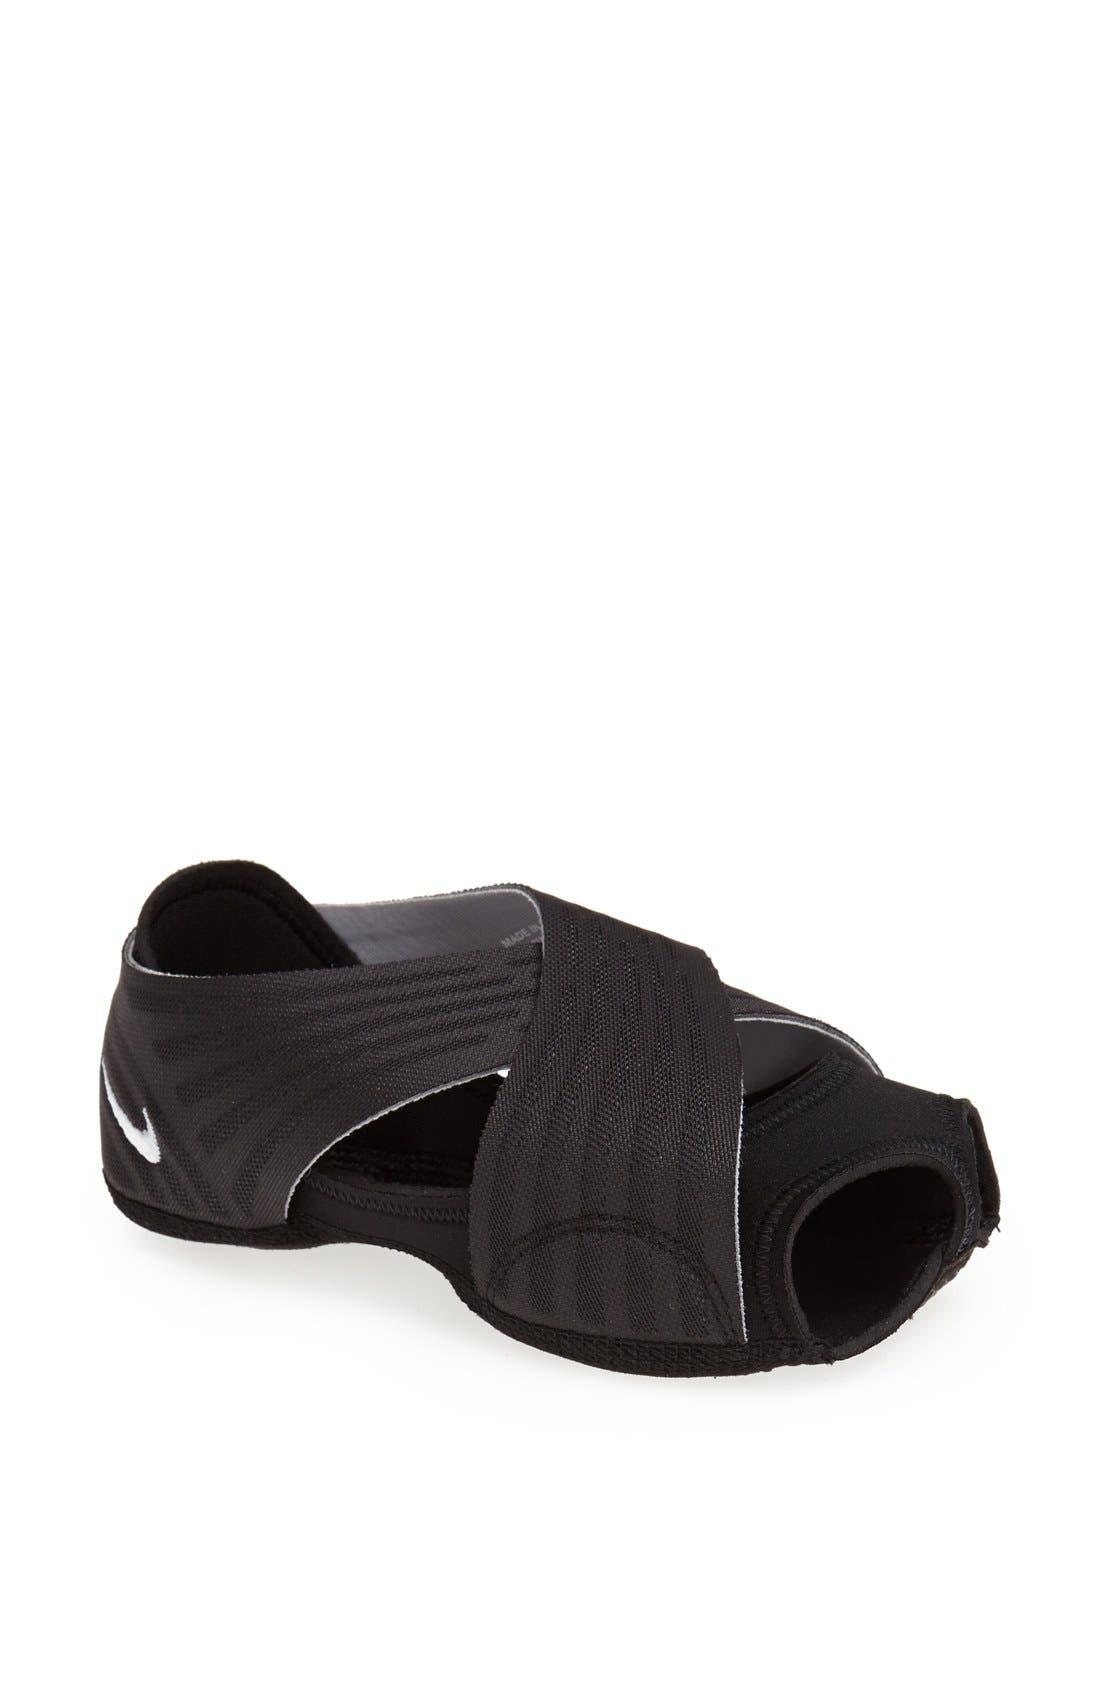 'Studio Wrap 2' Yoga Training Shoe,                             Main thumbnail 1, color,                             010